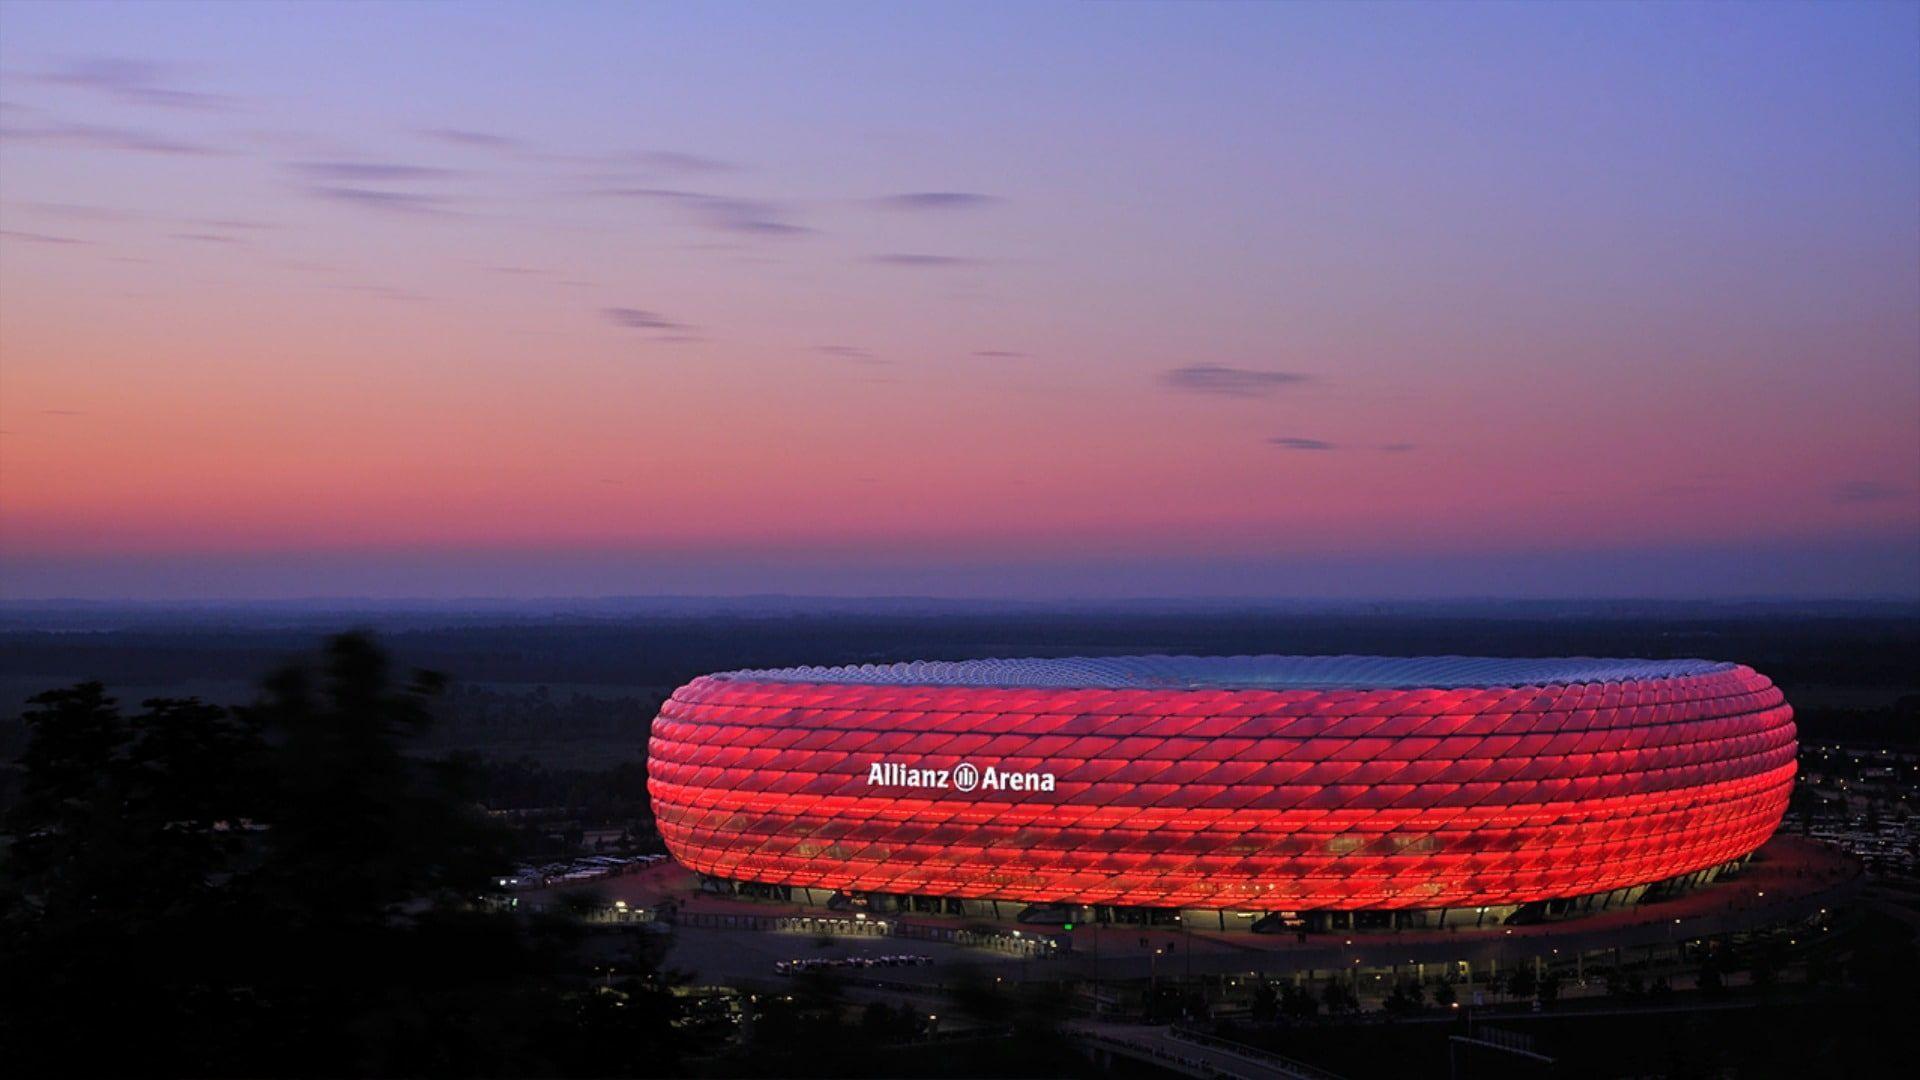 Germany Stadium Bayern Munchen Allianz Arena Bayern Munich 1080p Wallpaper Hdwallpaper Desktop Bayern Munich Wallpapers Bayern Bayern Munich